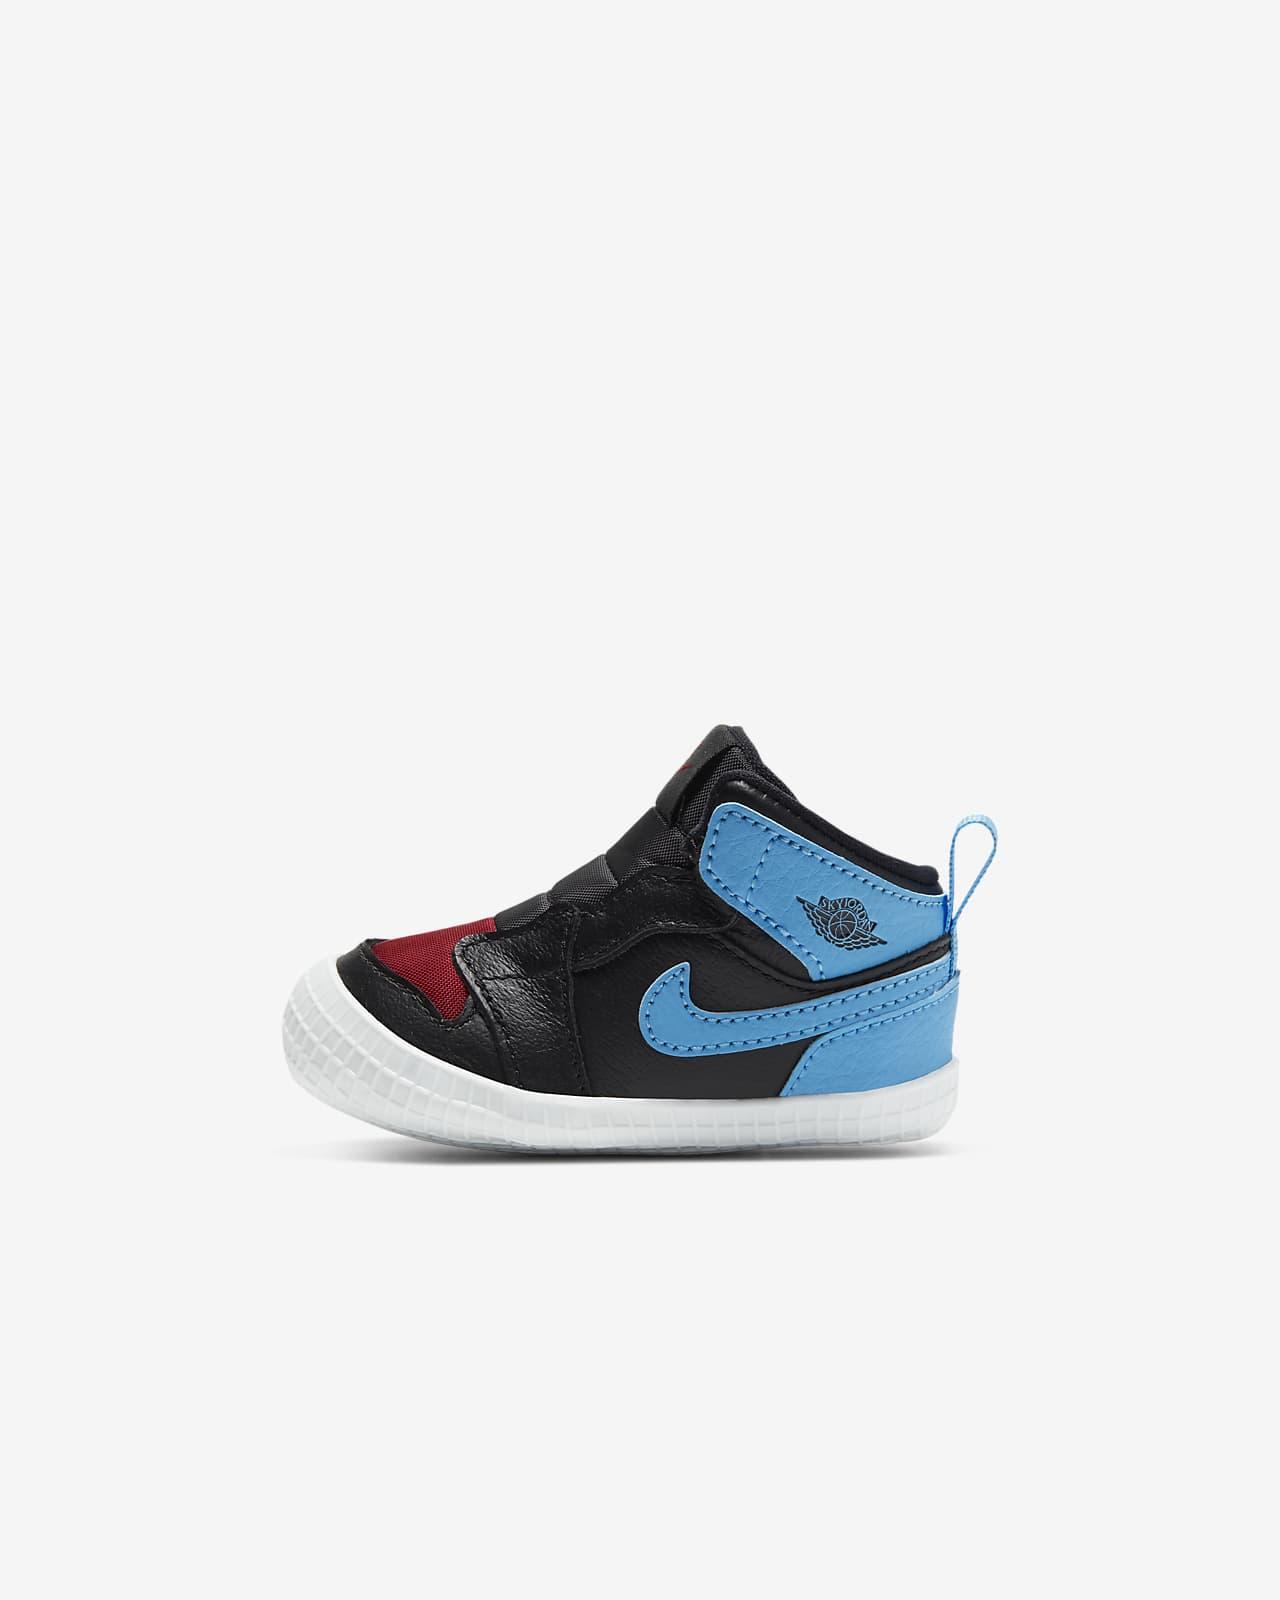 Jordan 1 Baby Cot Bootie. Nike LU